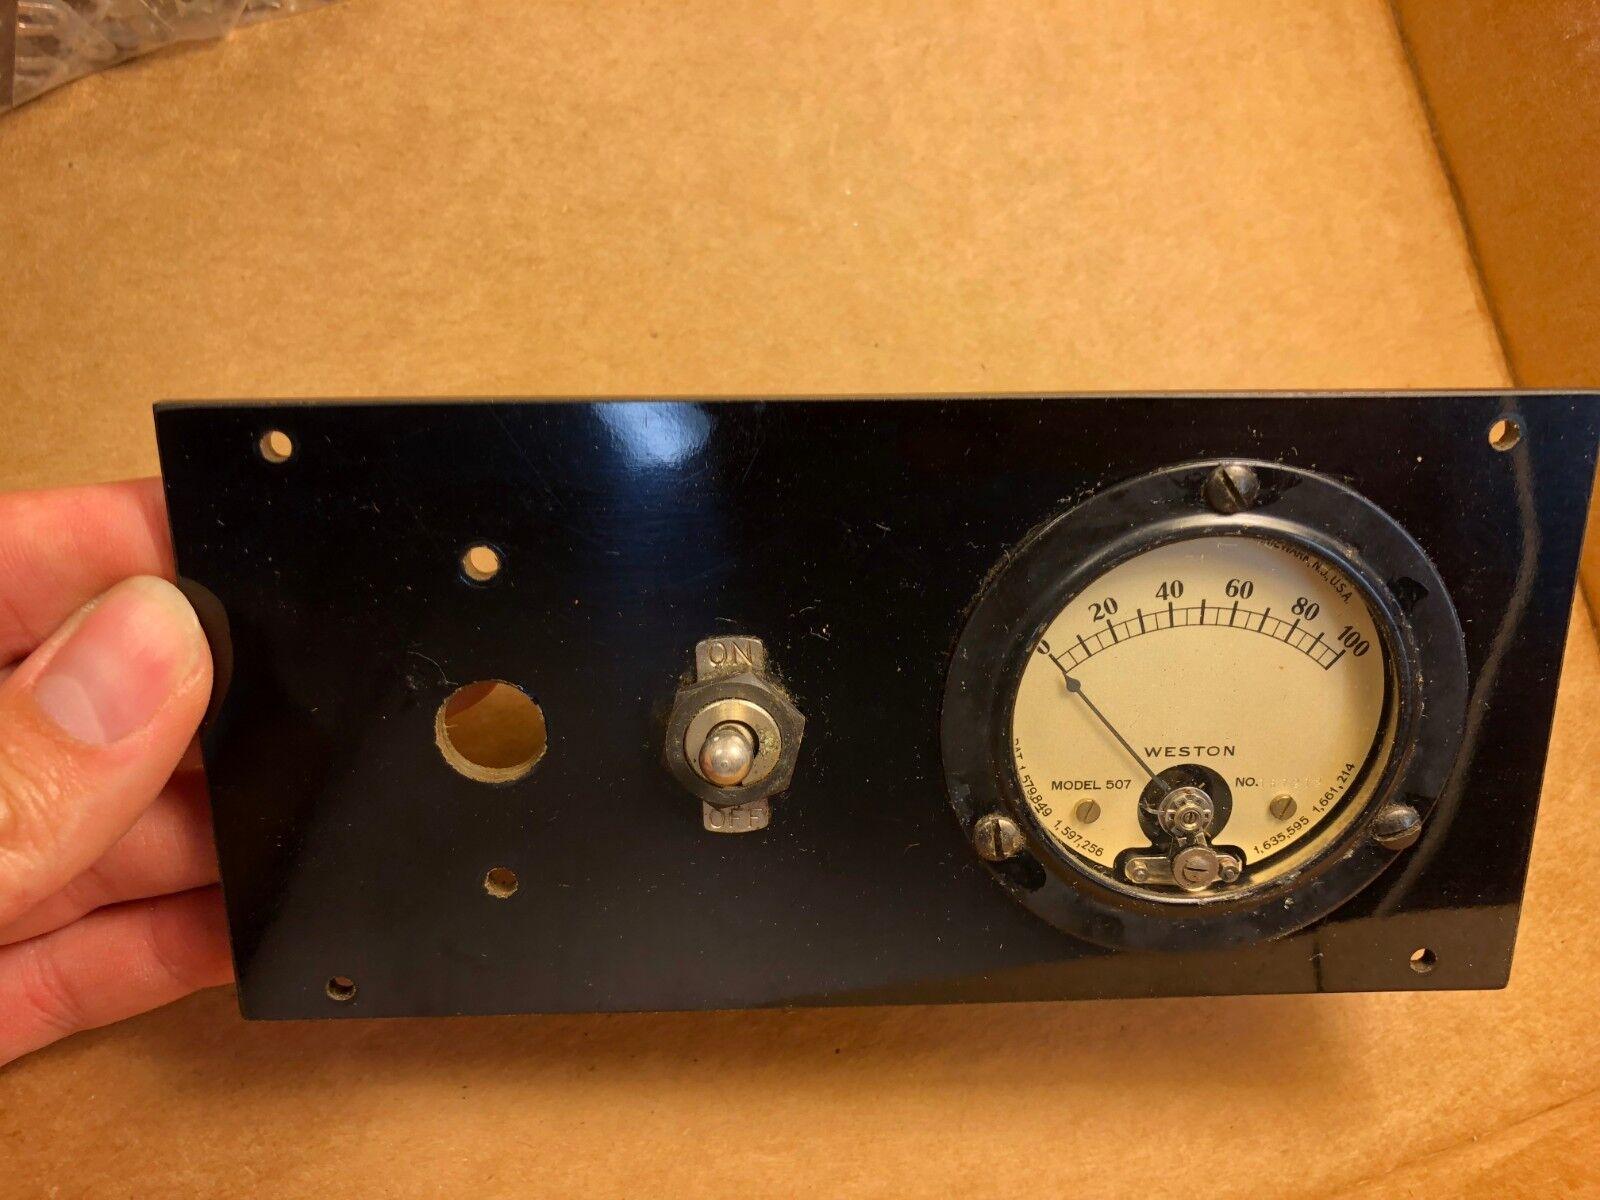 Antiguo Modelo 507 507 507 metros Weston mide 0-100 calibre 1920s o 1930s montado  hasta un 60% de descuento